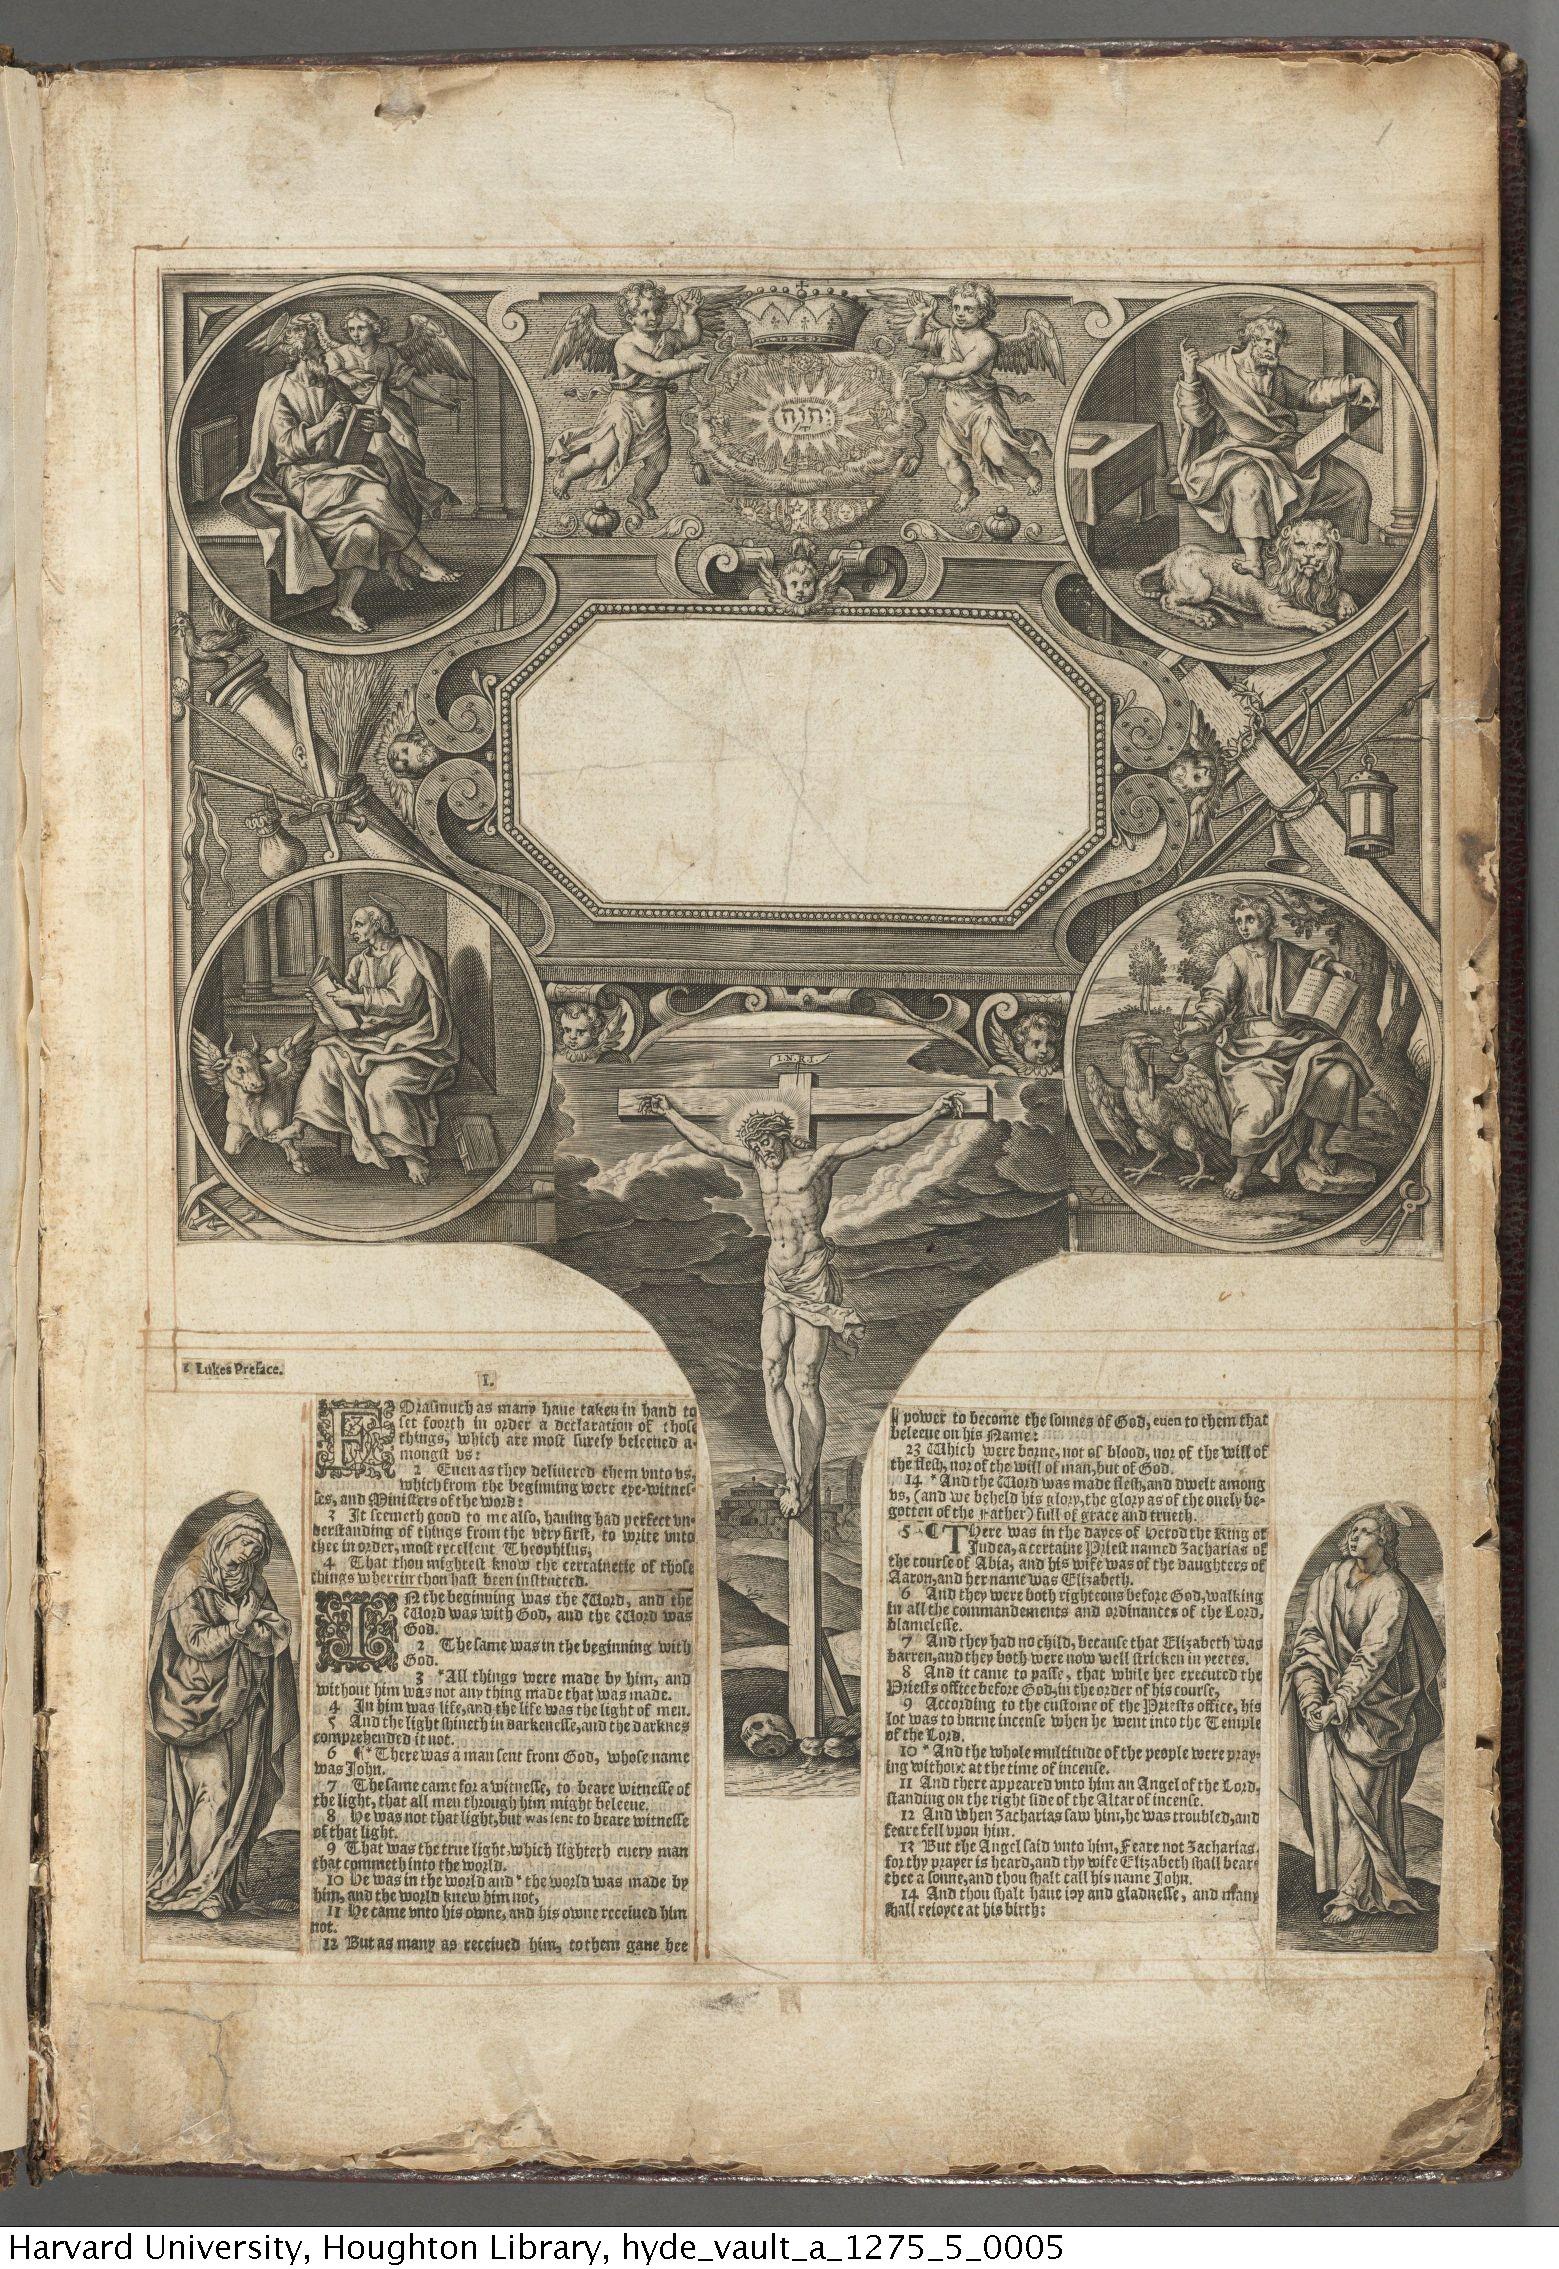 Little Gidding concordance, 1630. A 1275.5